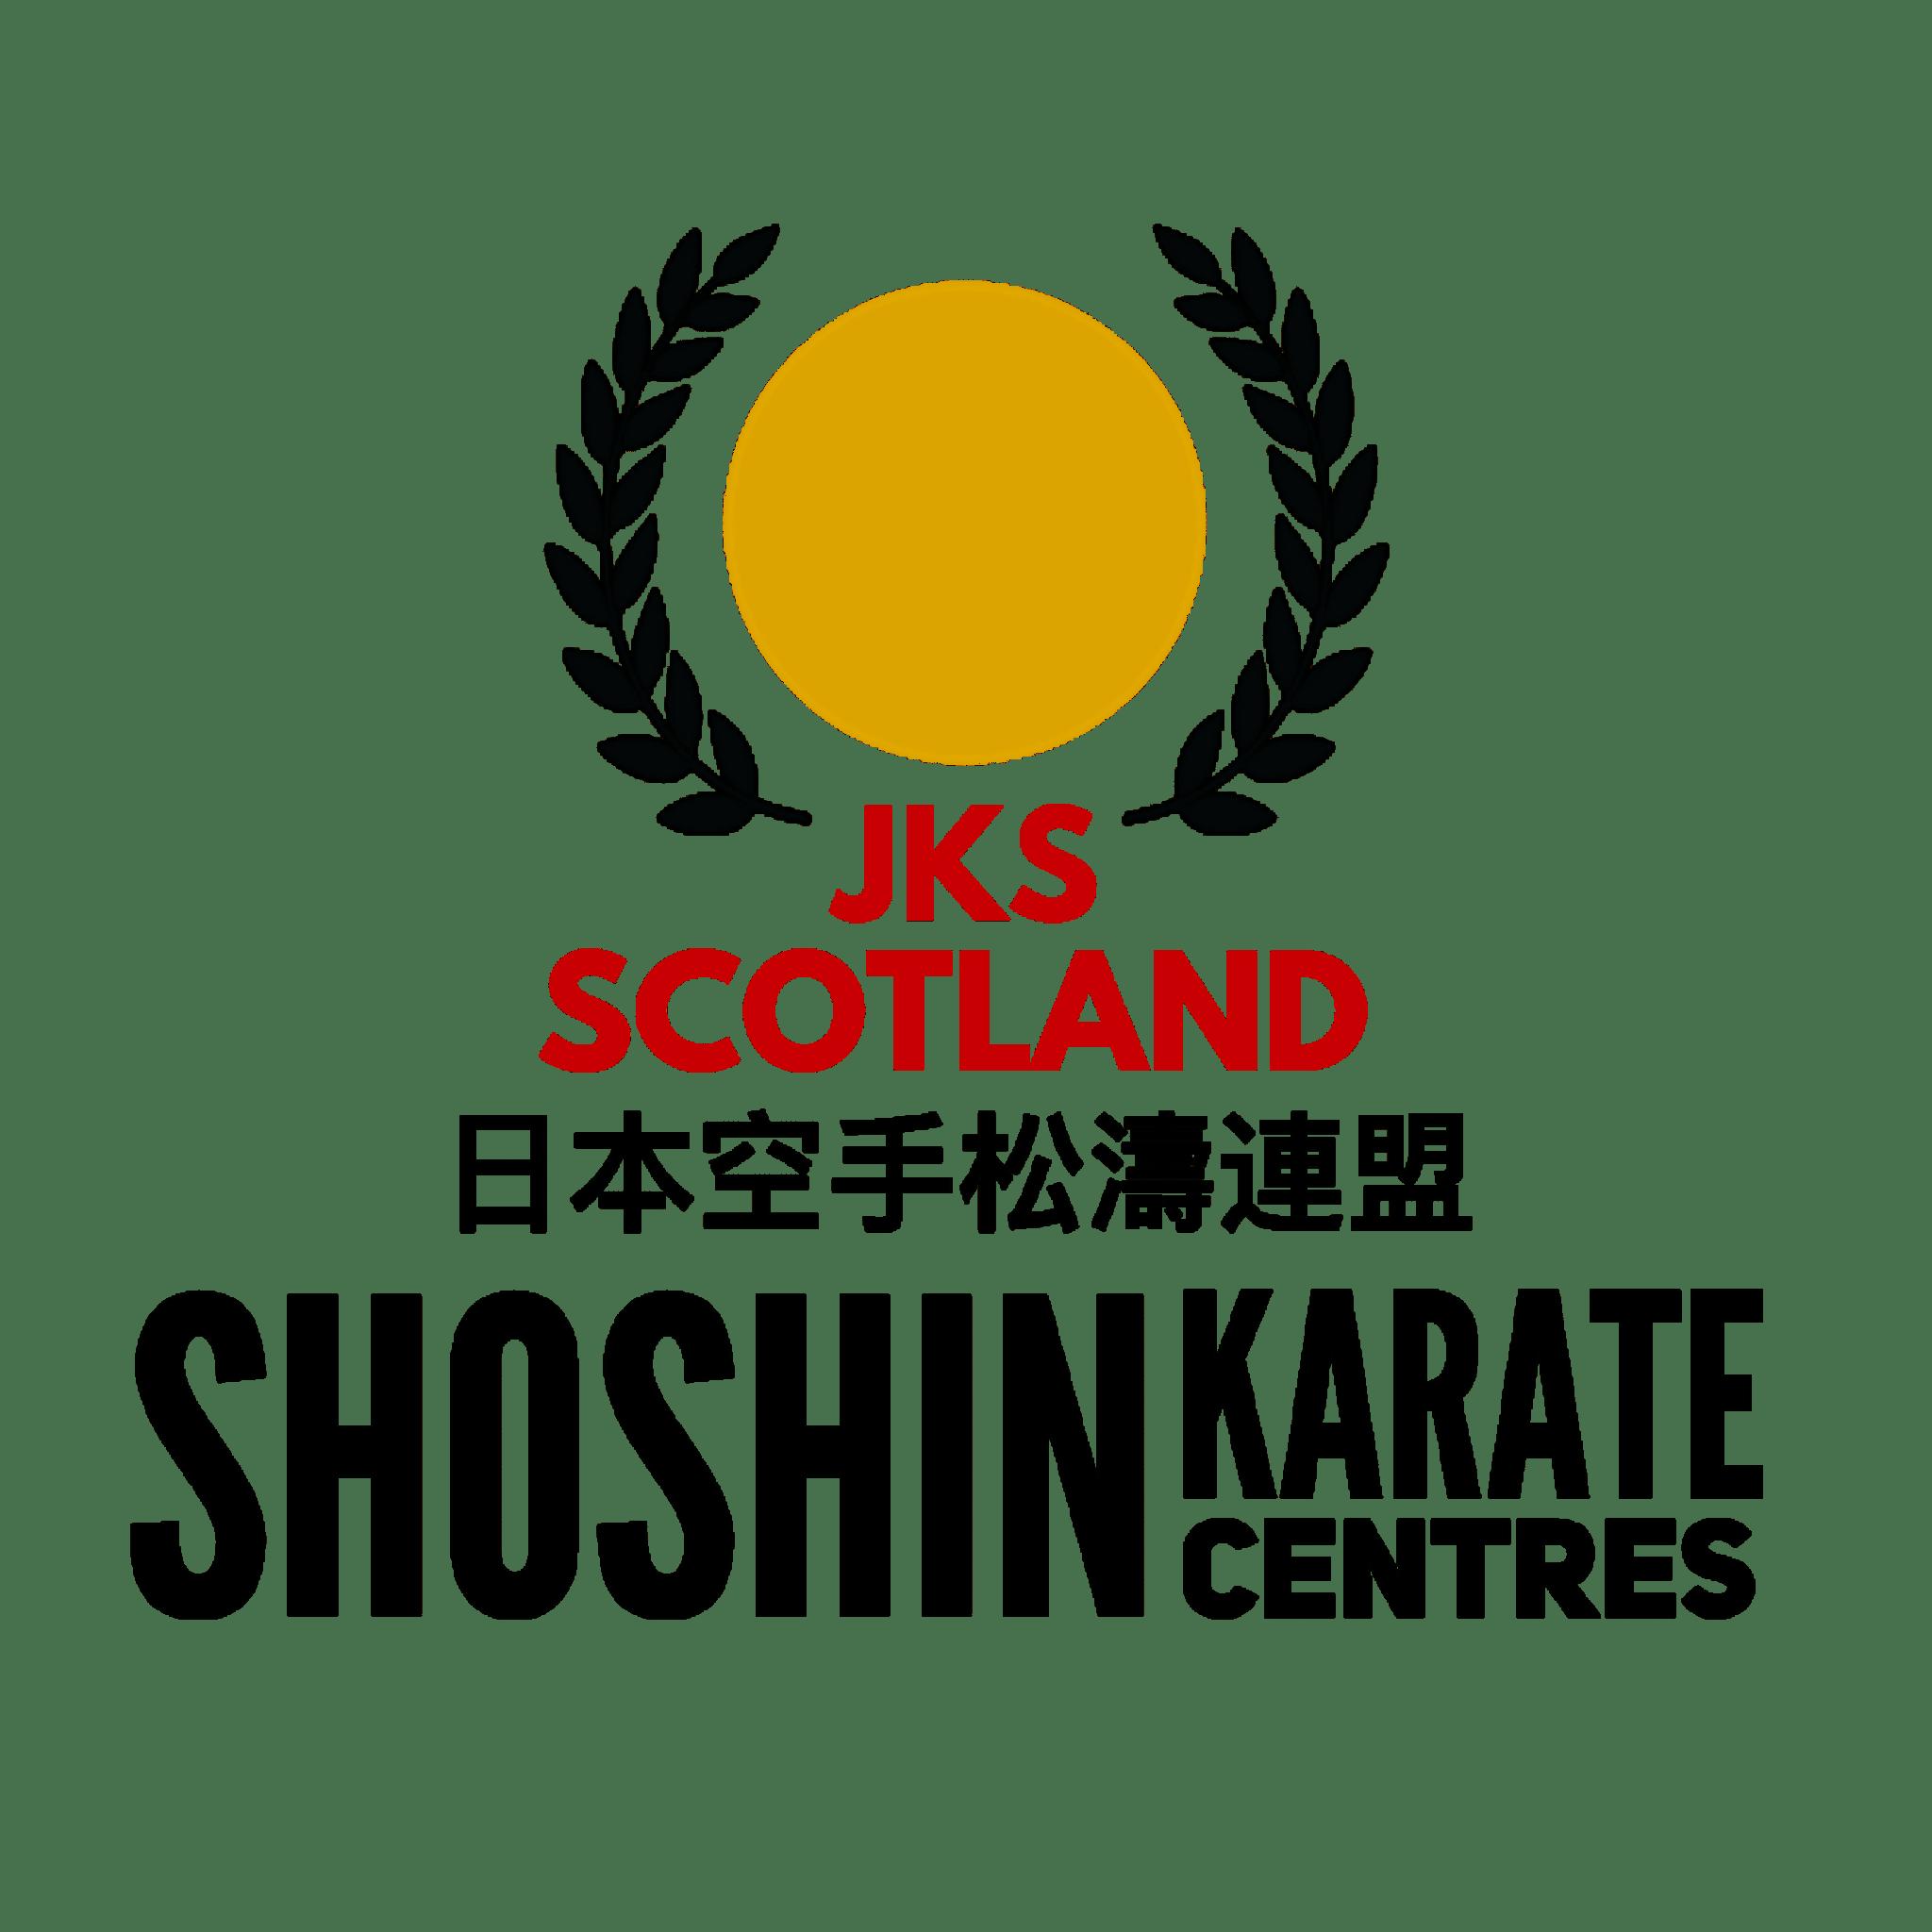 Shoshin Karate Centres